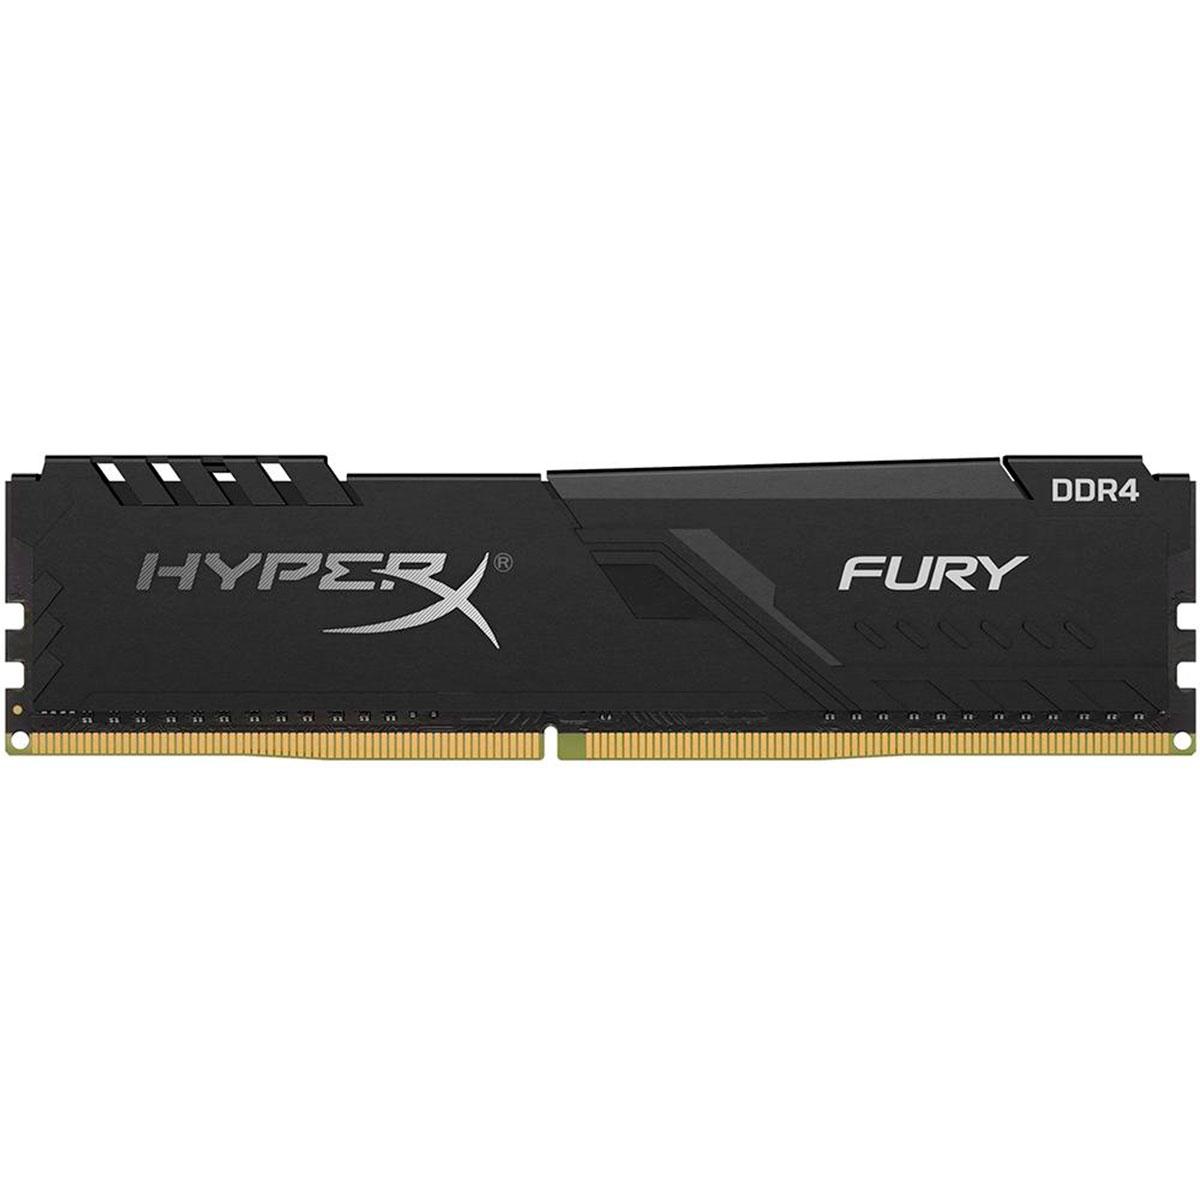 Memória Kingston HyperX Fury Black 8GB DDR4 2400MHz DDR4 CL15 - HX424C15FB3/8